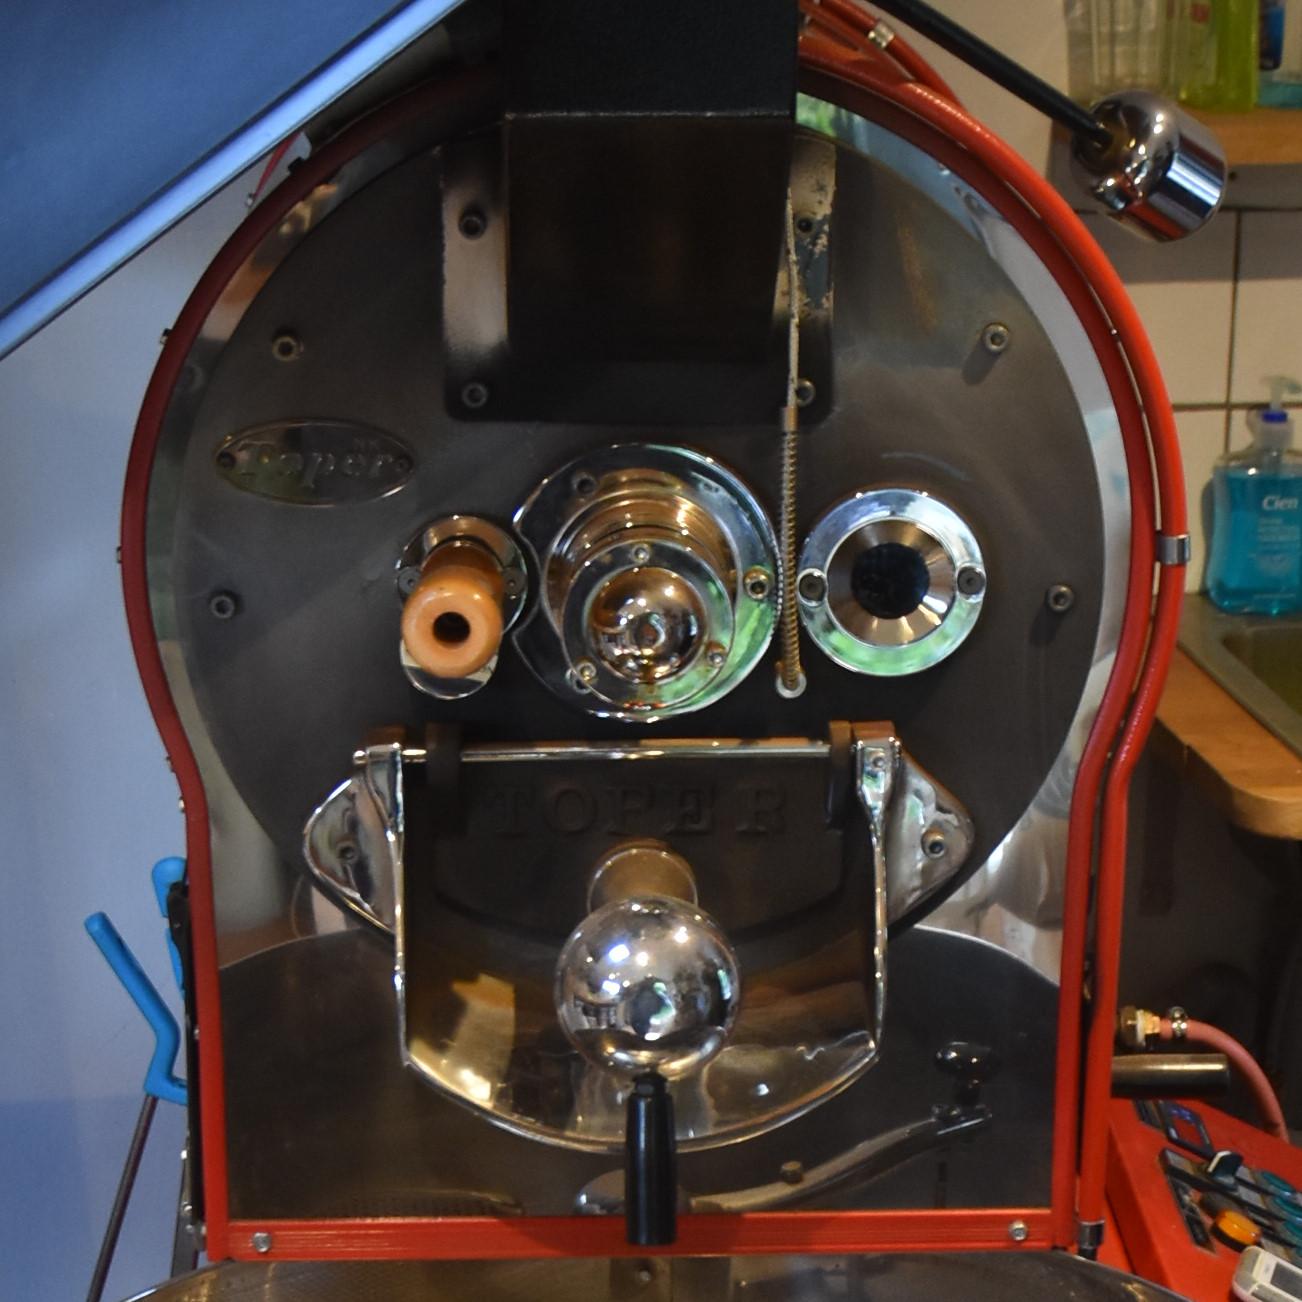 The 10 kg Toper roaster in the Roastery Shack, Surrey Hills Coffee's bespoke roastery.